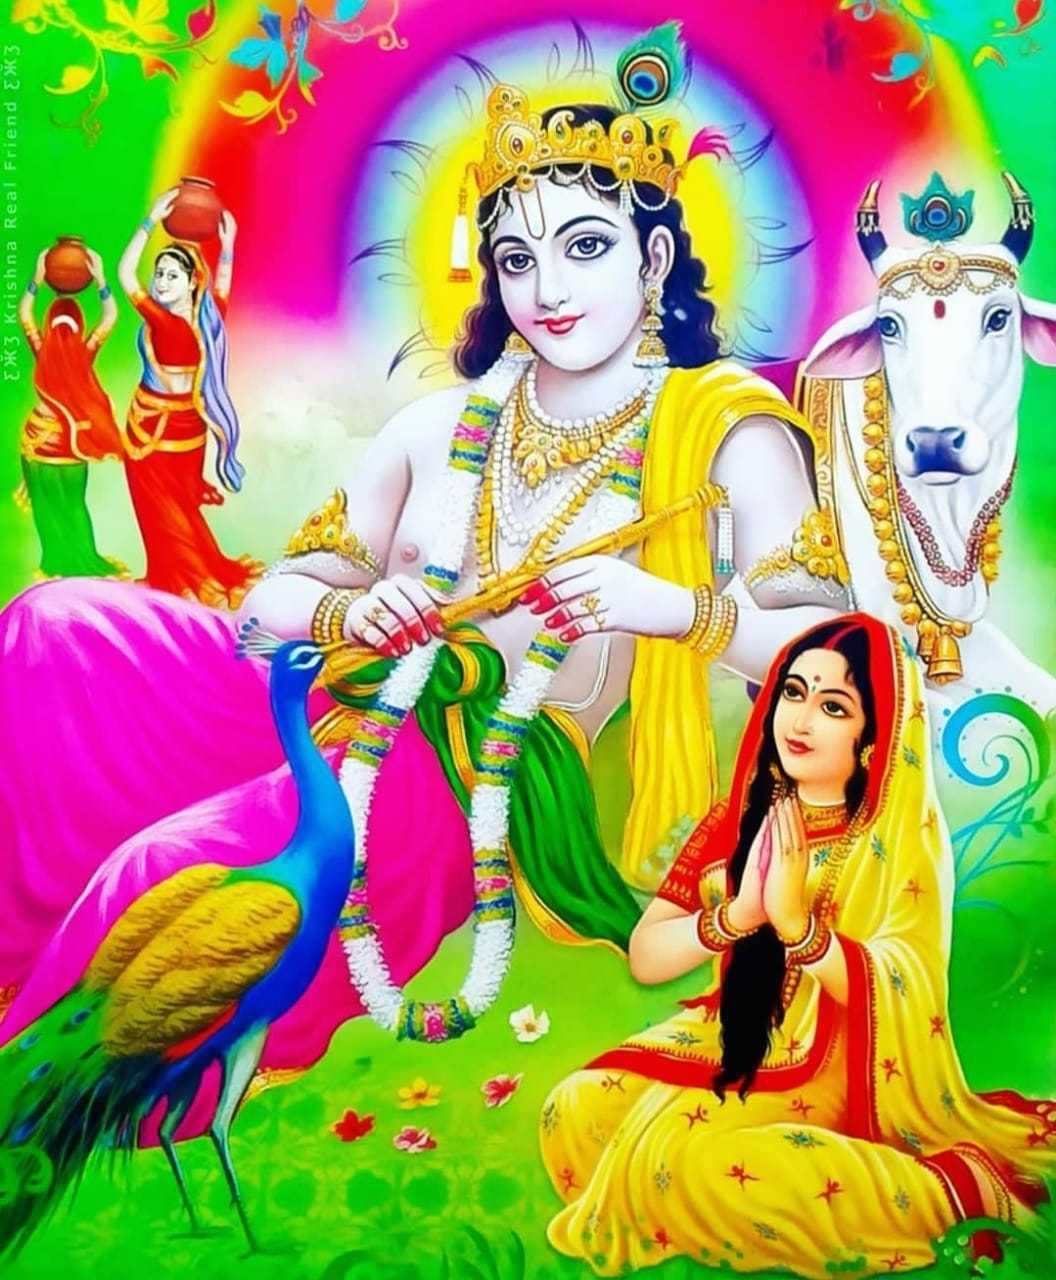 Bansuri Bajate Hue Lord Krishna Ka Beautiful Wallpaper - Shree hari krishna bansuri wallpaper free download for desktop screen. We are share awesome krishna flute wallpaper Images to download for free.